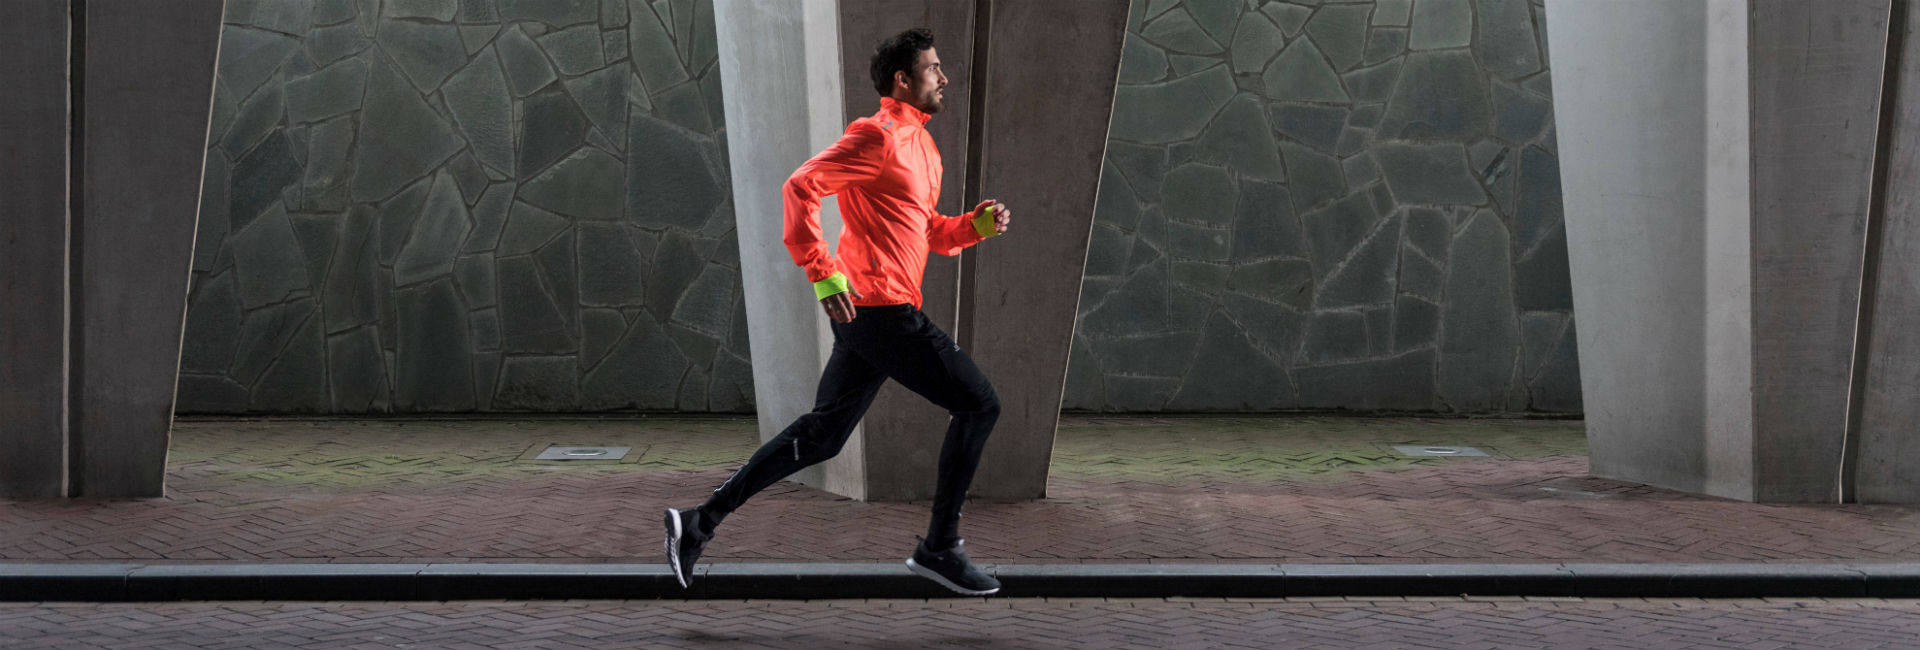 Mas / Hrmax: How Should You Train?